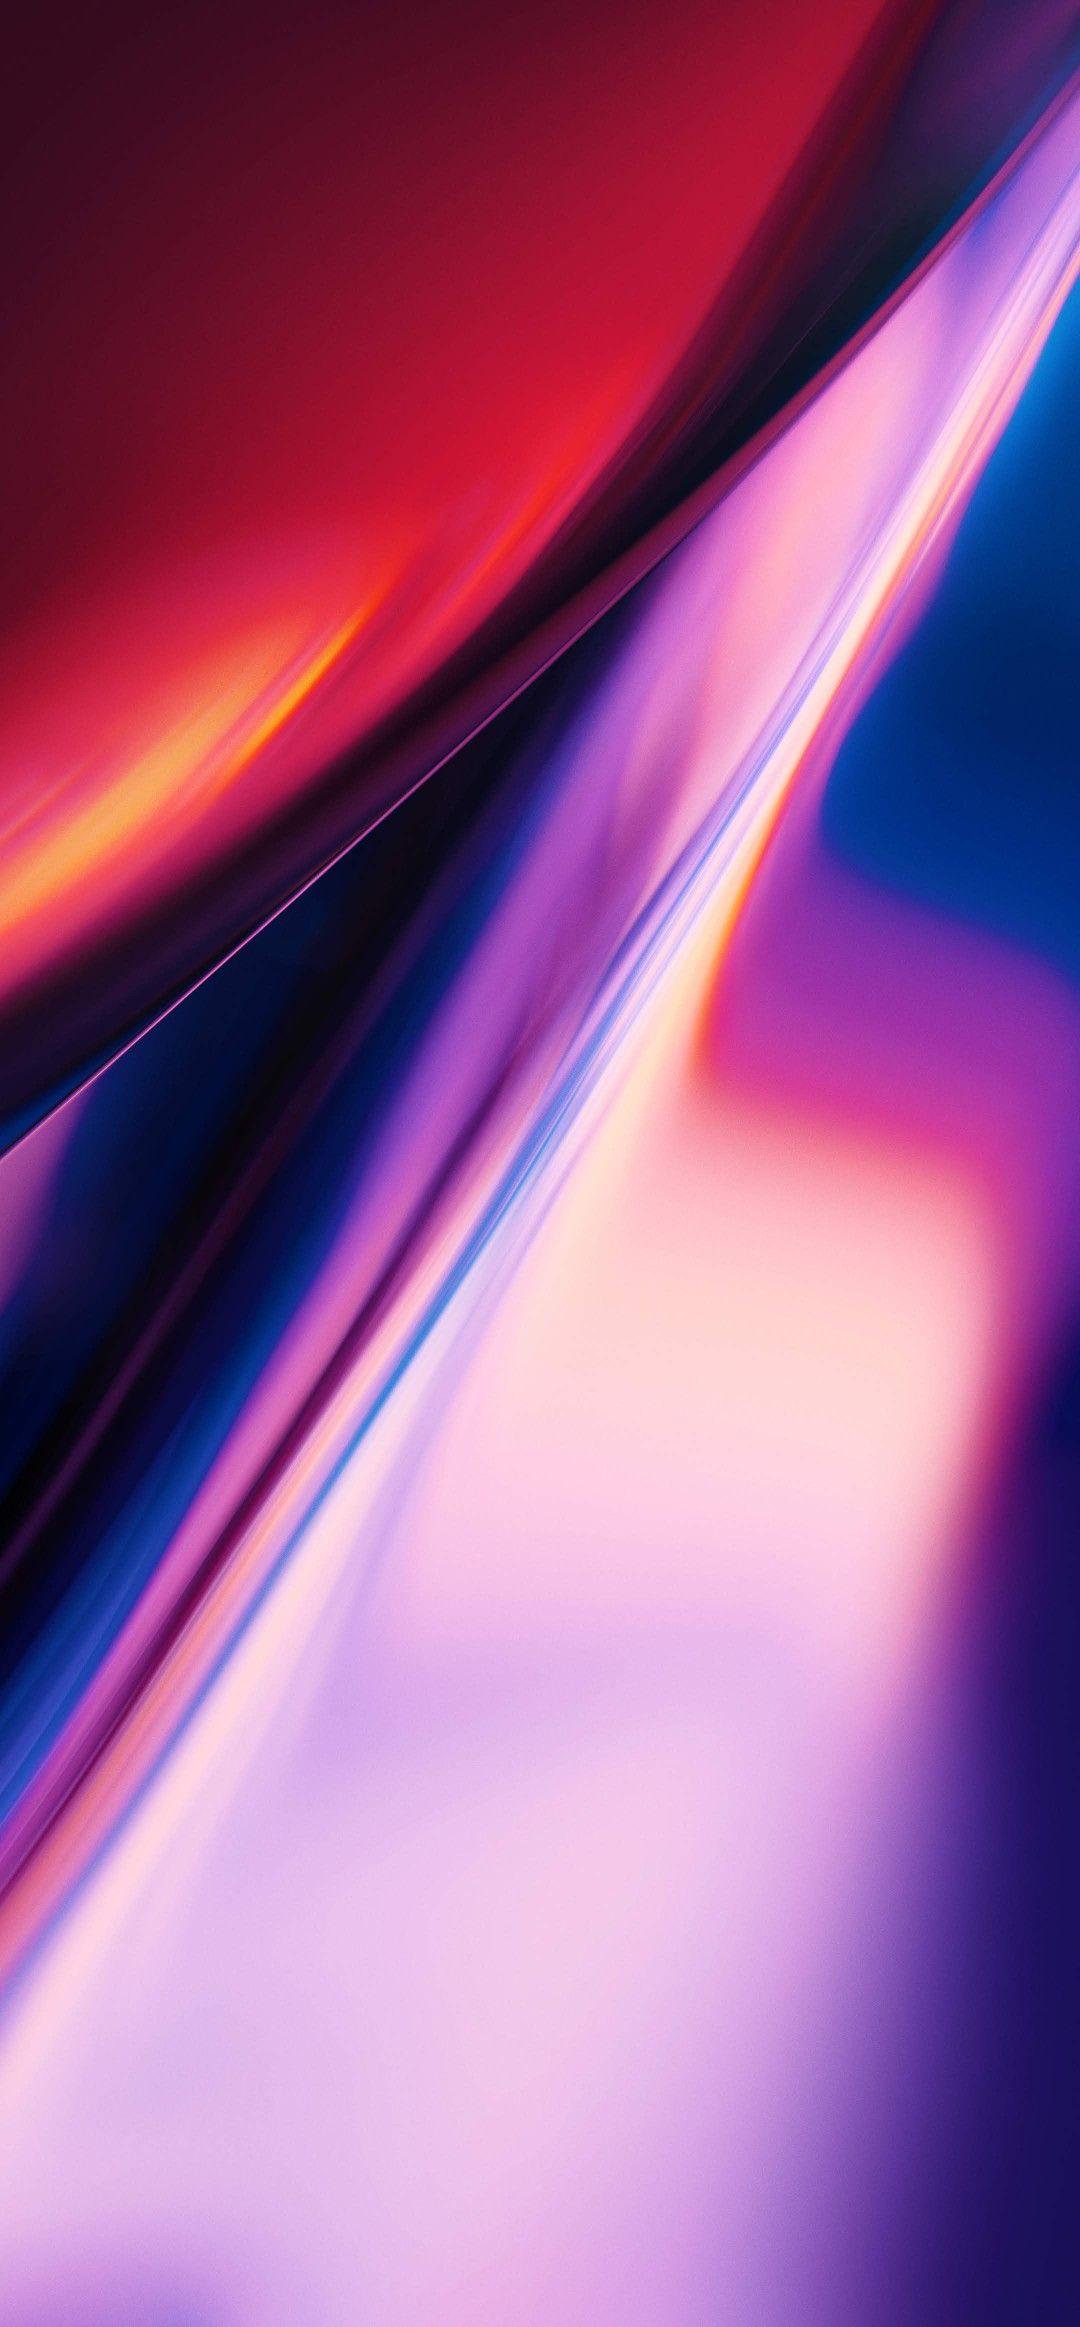 OnePlus 7 Pro Stock wallpaper, Oneplus wallpapers, Hd